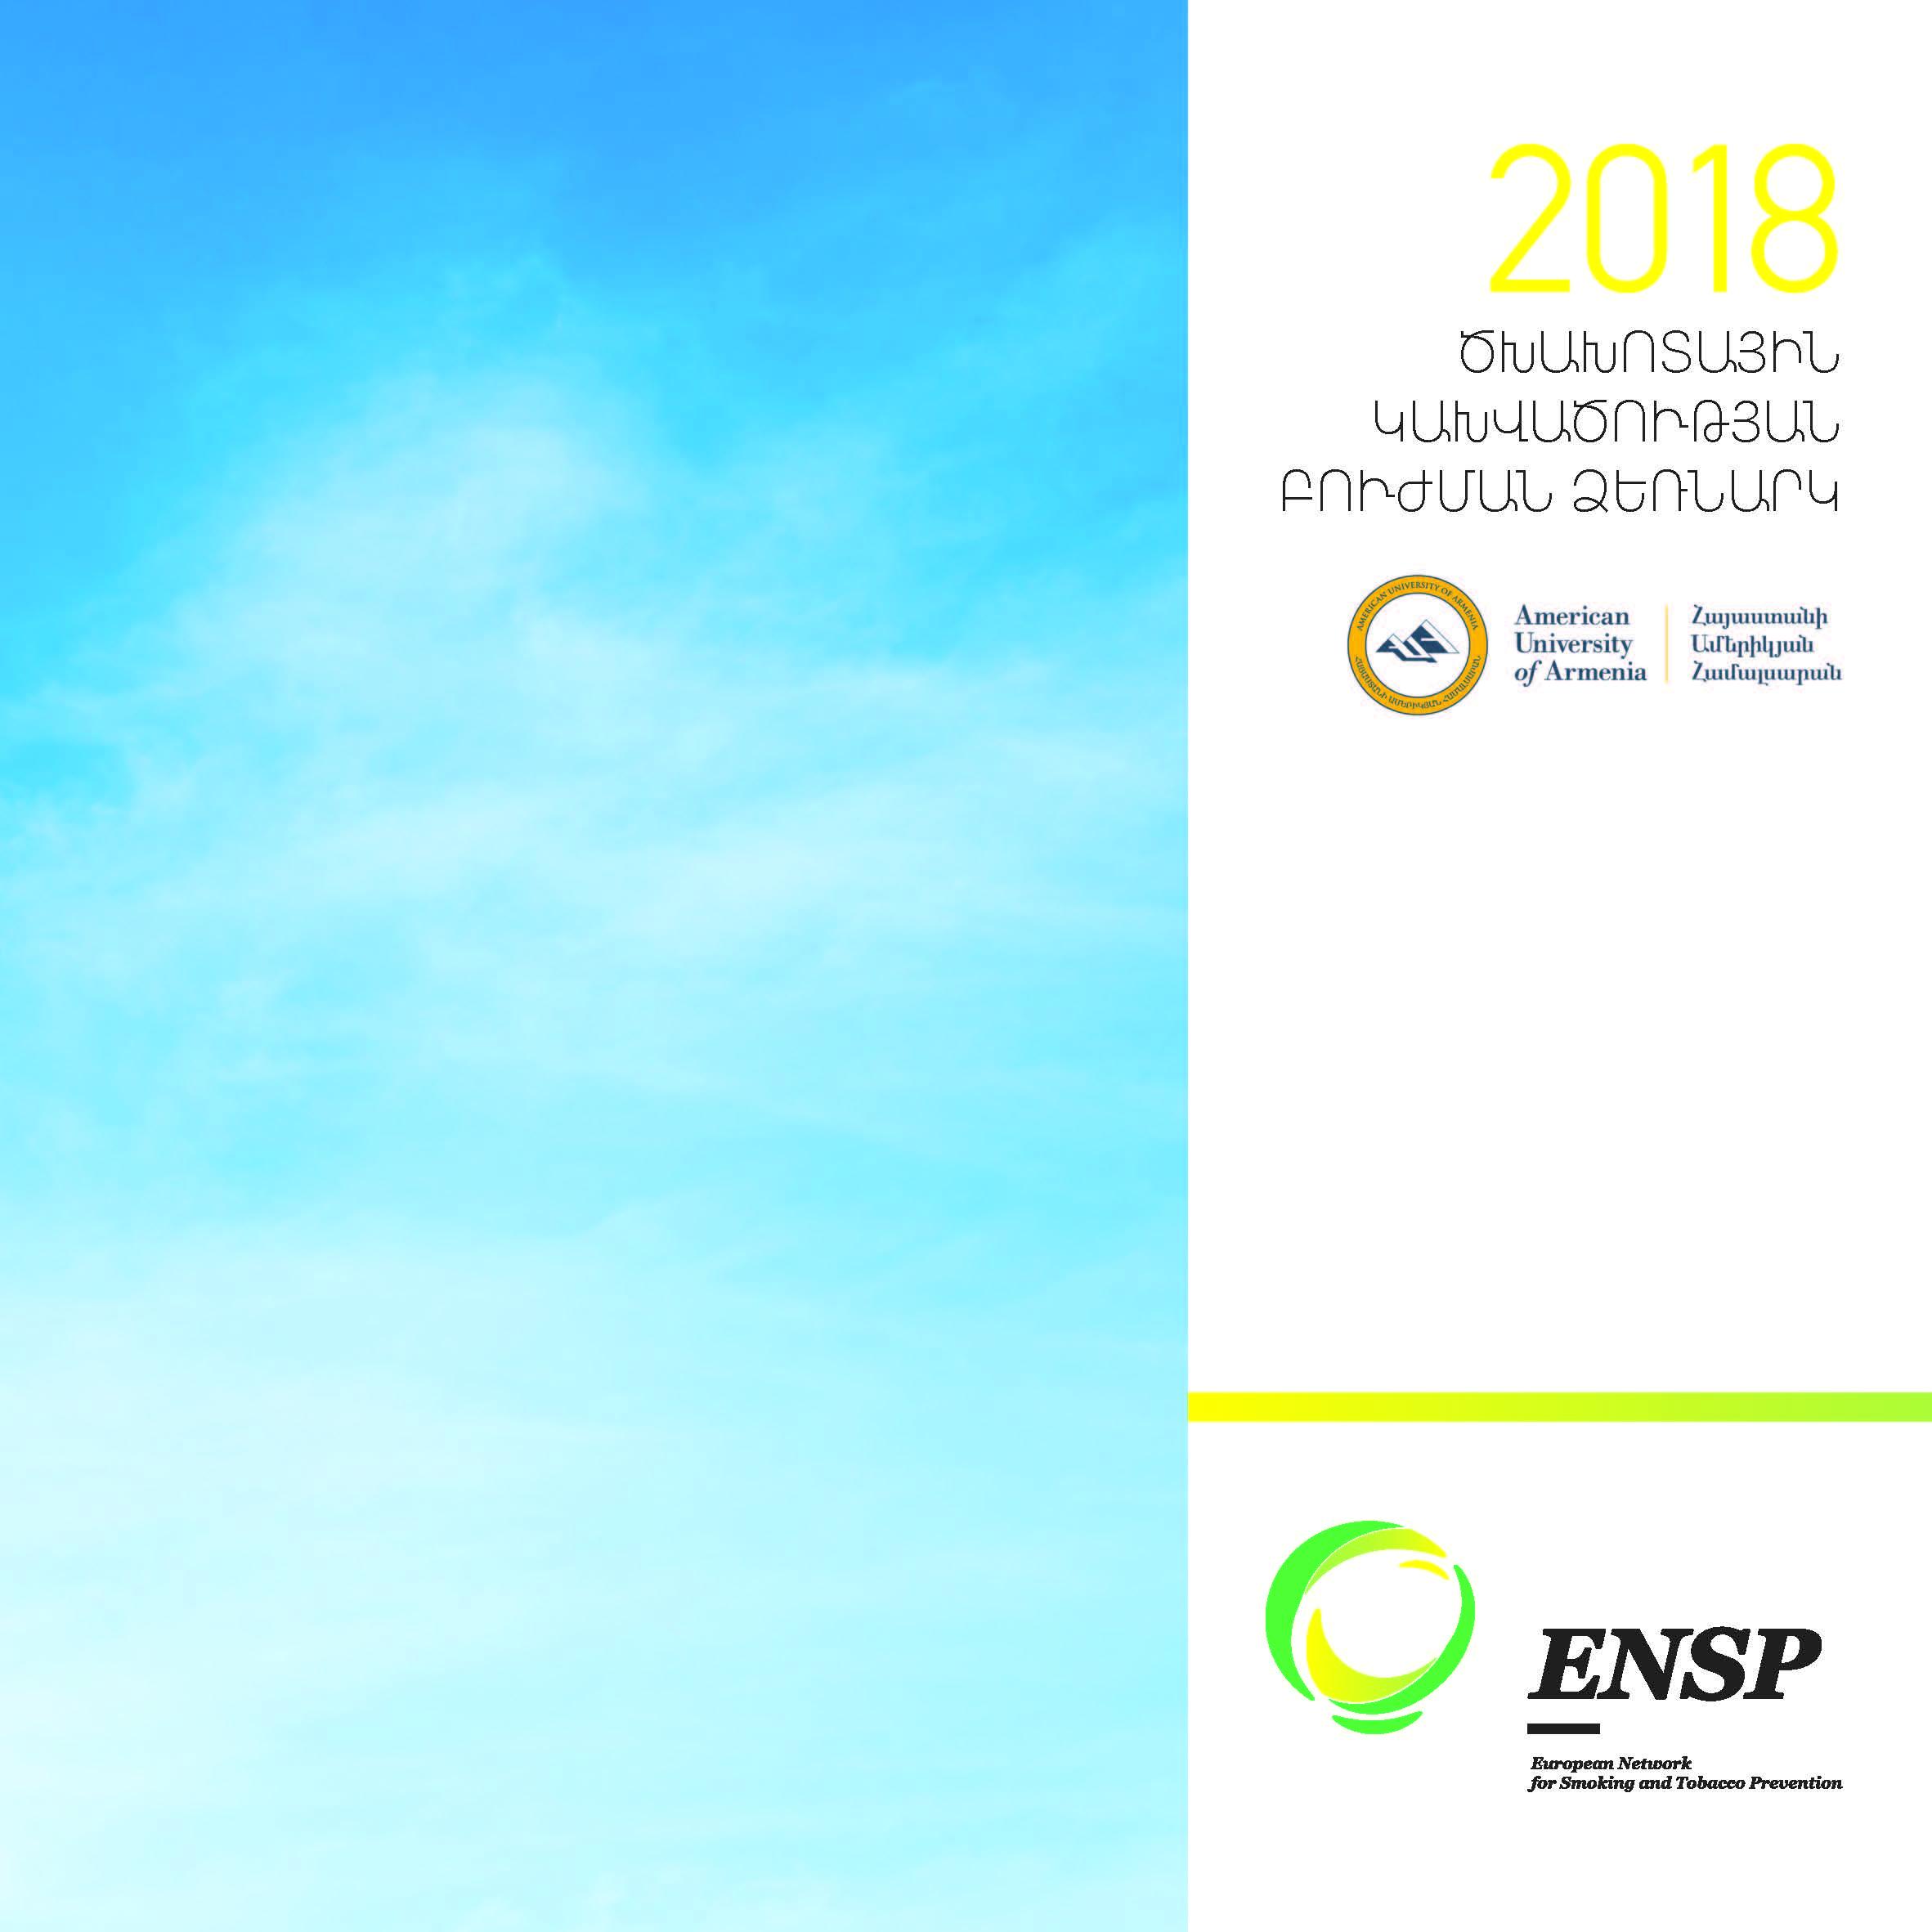 guidelines_2018_armenia_Page_001.jpg